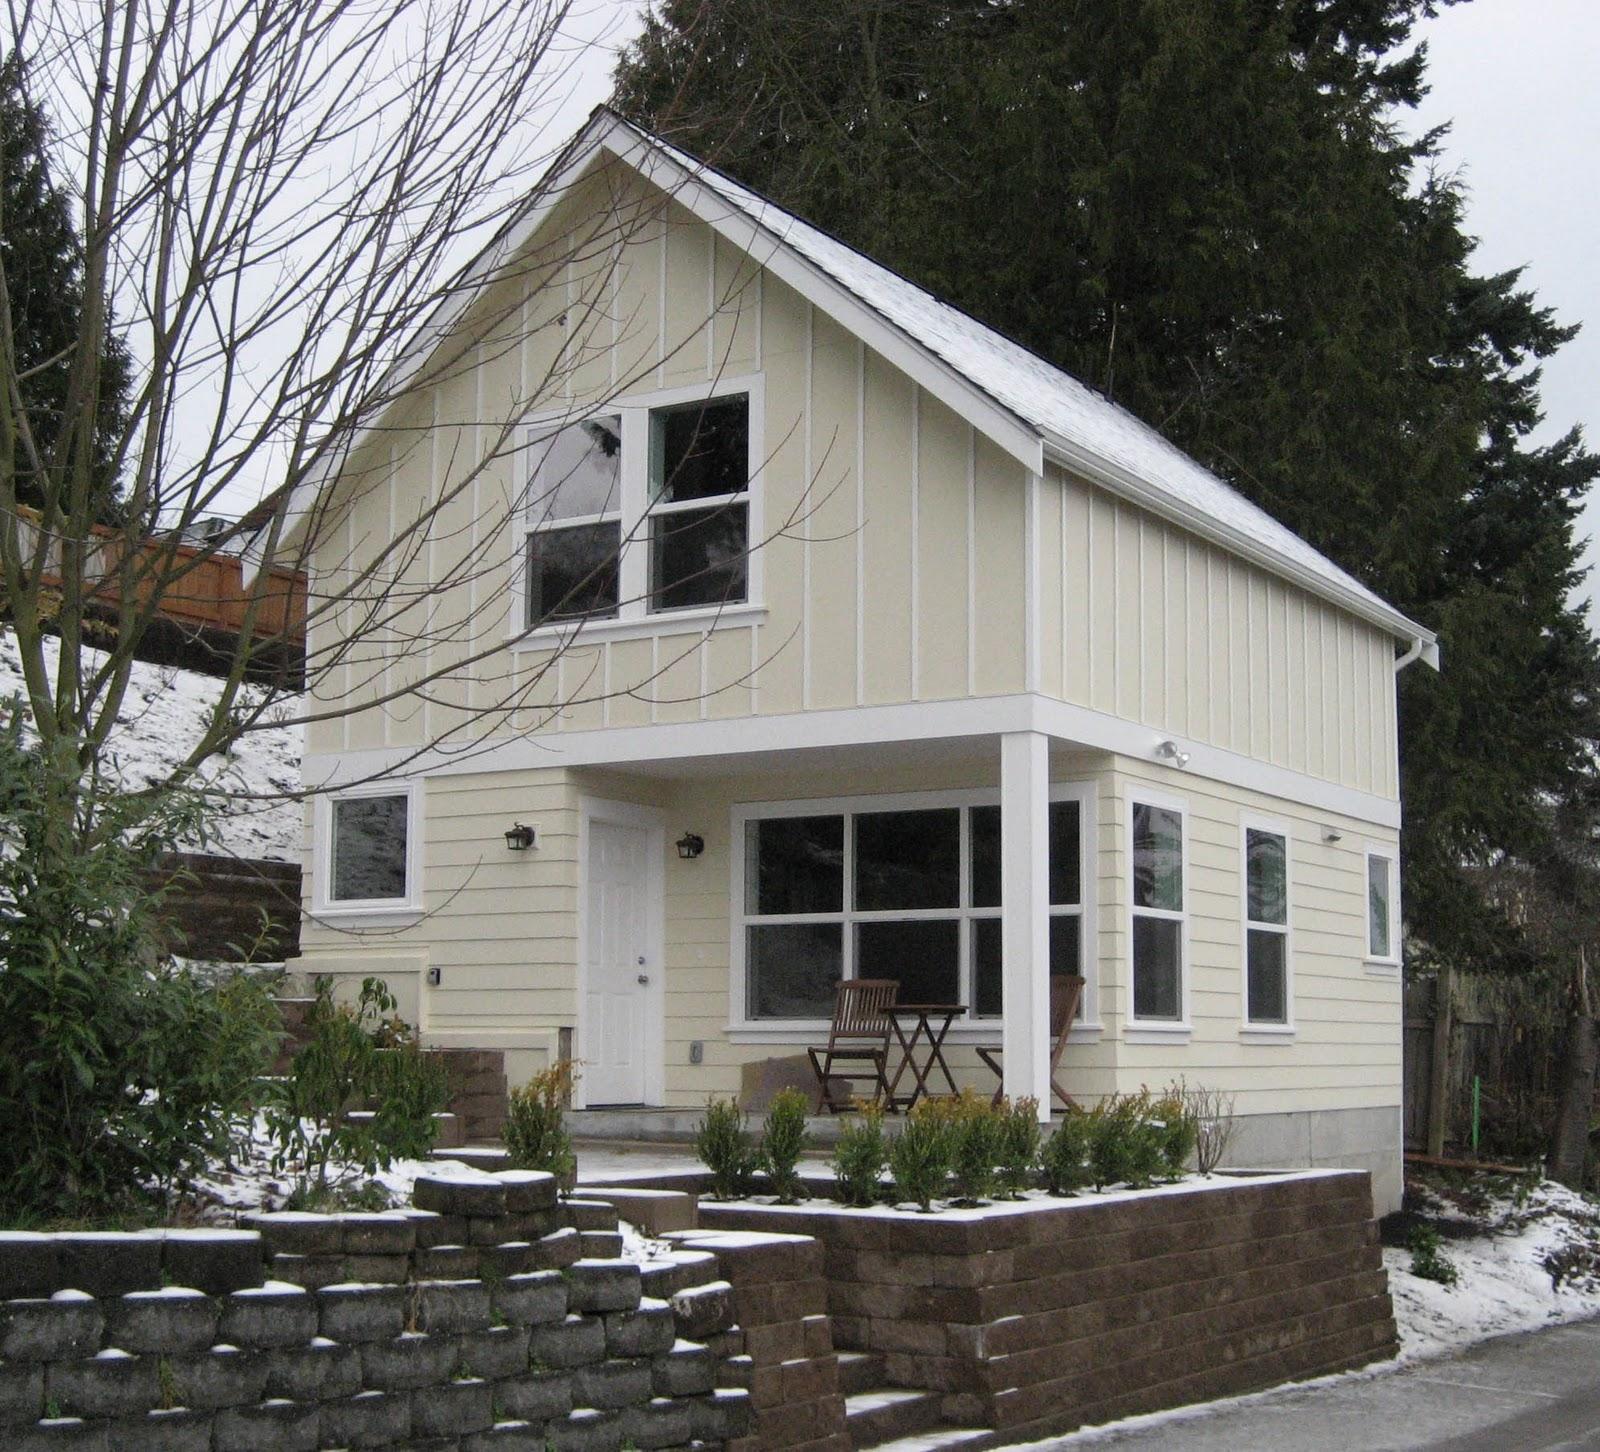 Backyard cottage blog upcoming backyard cottage open house for Seattle backyard cottage